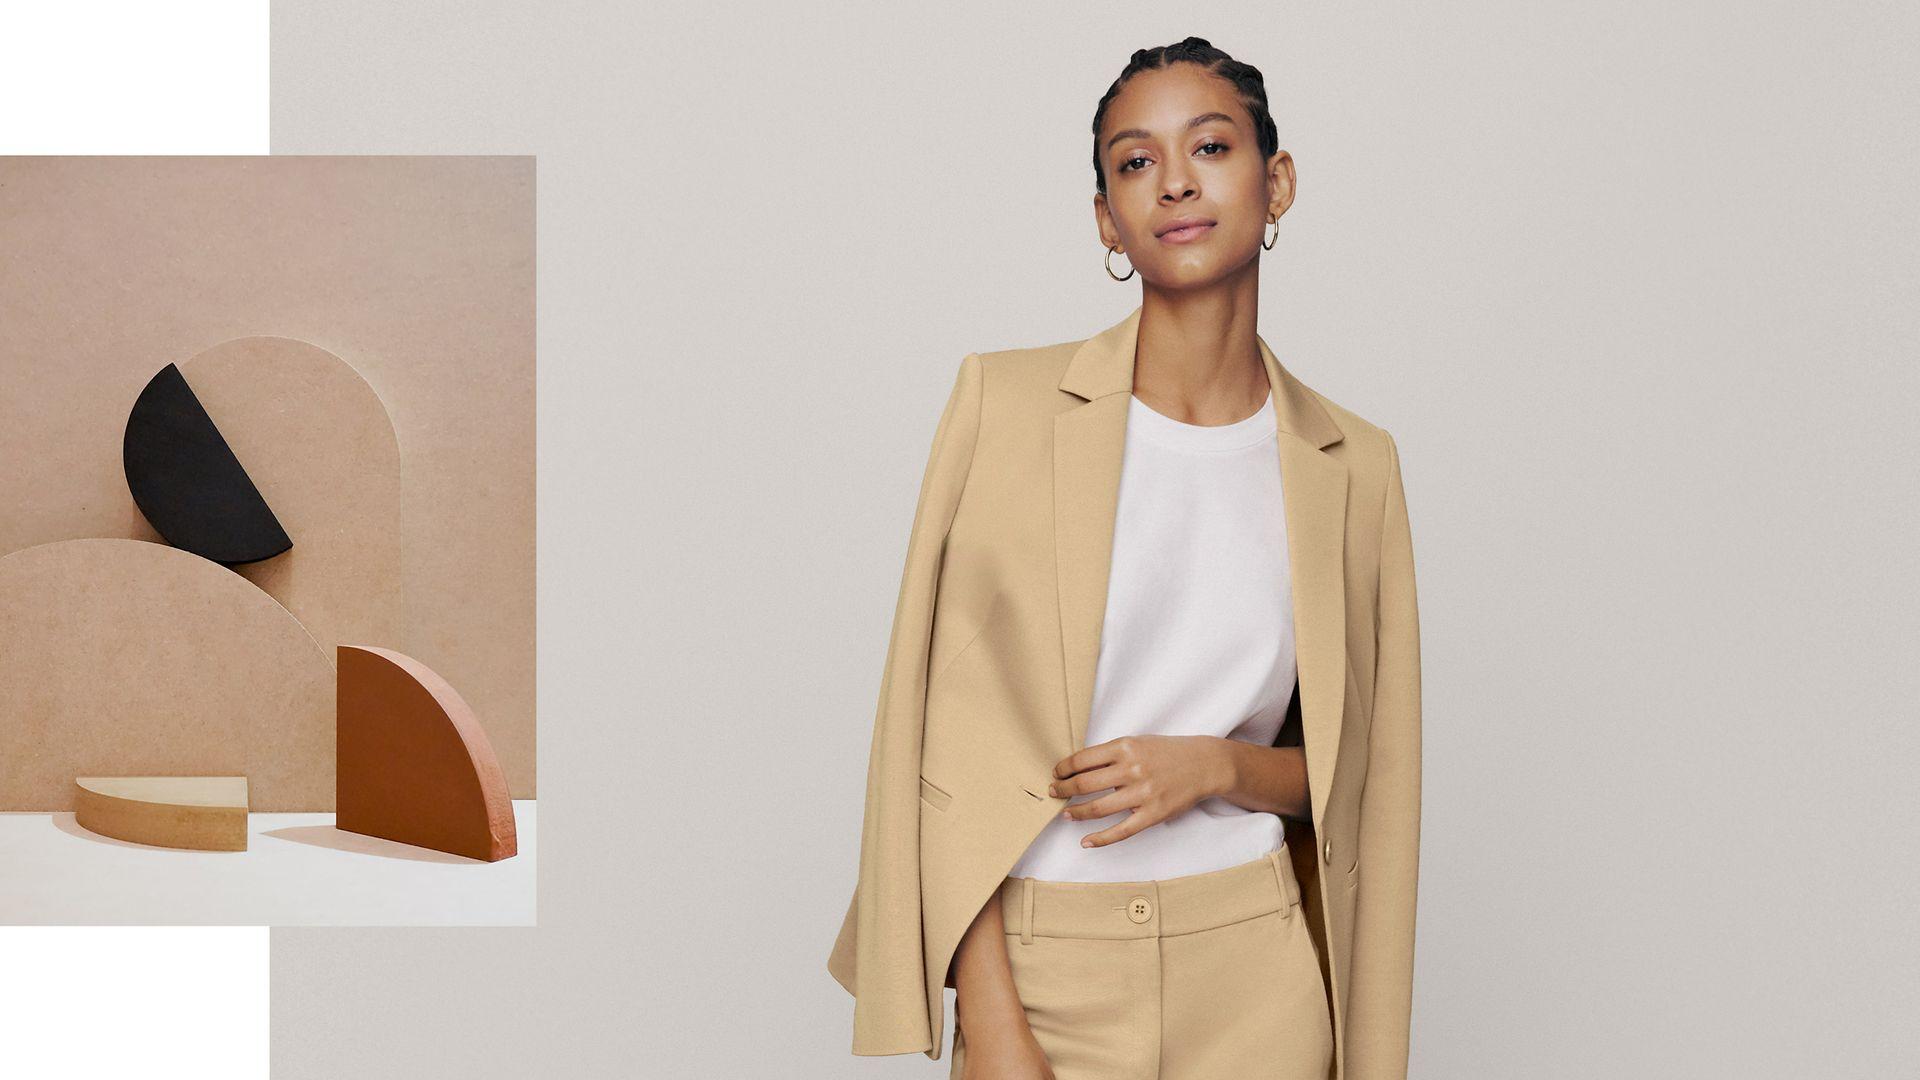 072021 - Women - Inspiration - Lookbook - Simply perfect trousers - Hero Large 4 - IMG - V2.jpg (1)